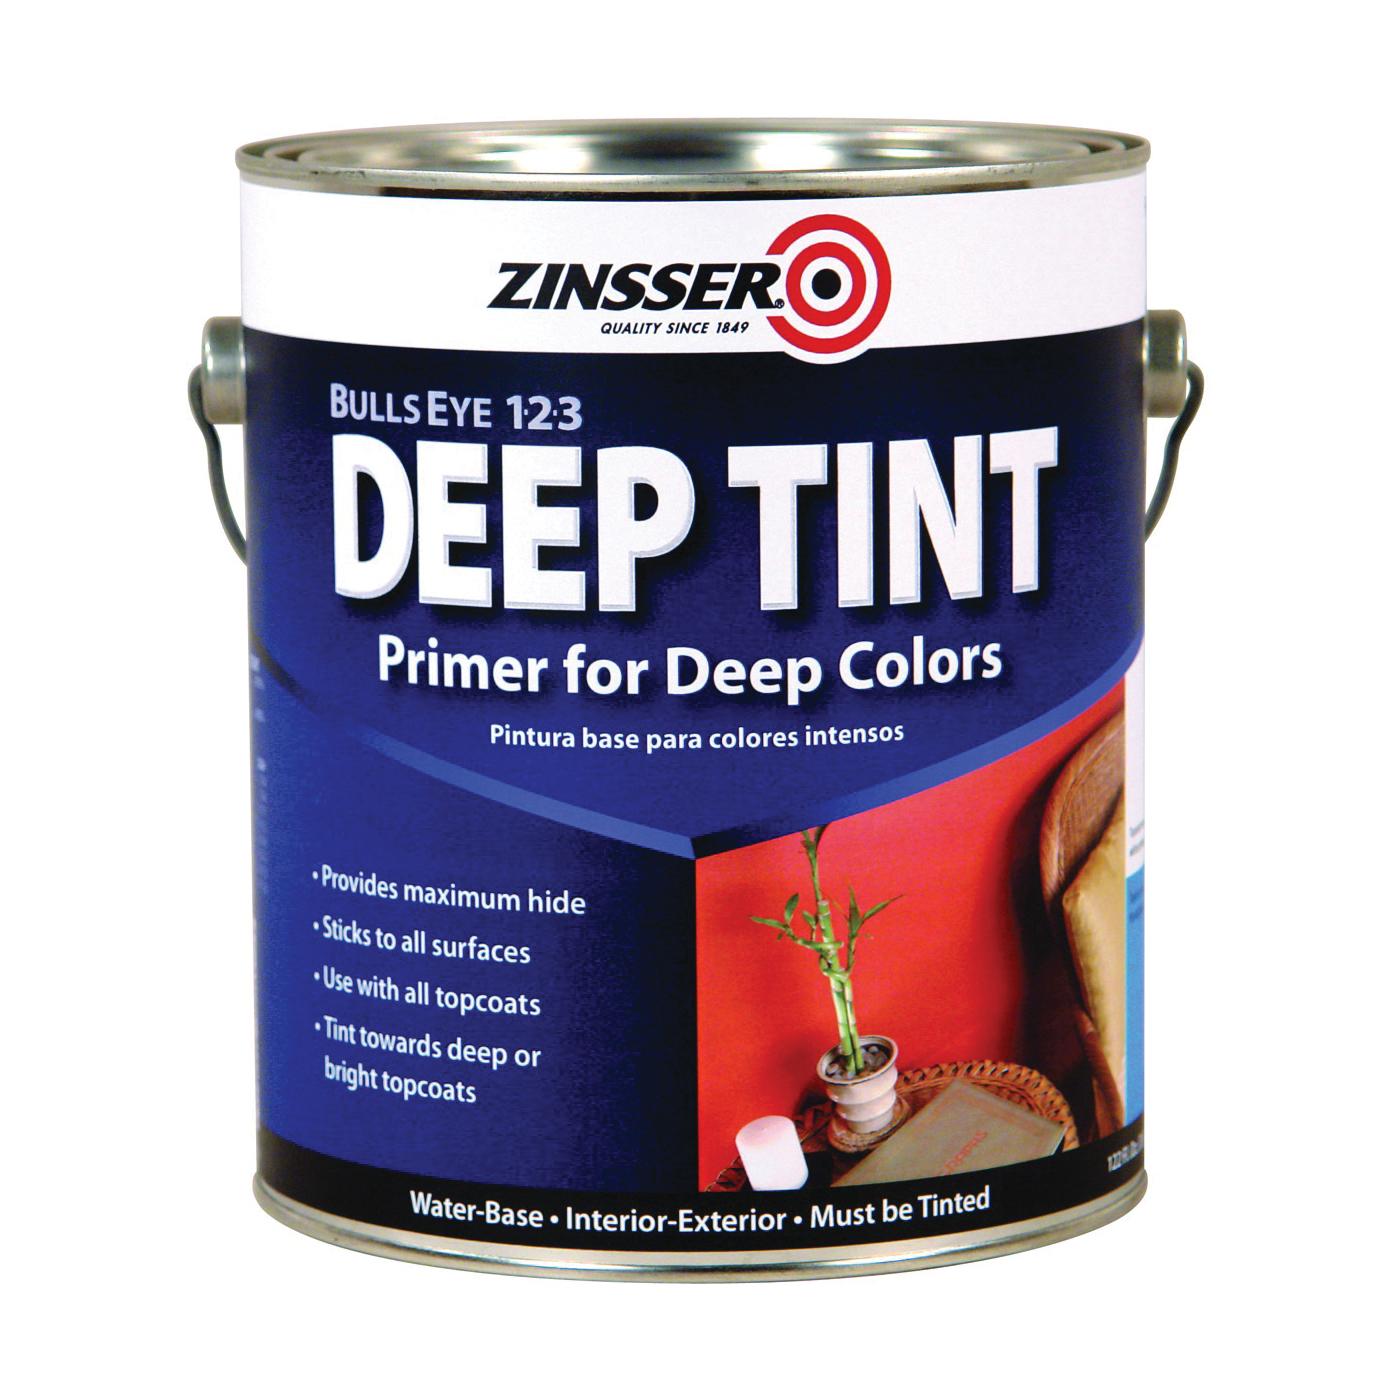 Picture of ZINSSER Bulls Eye 2031 Deep Tint Primer, White, 1 gal